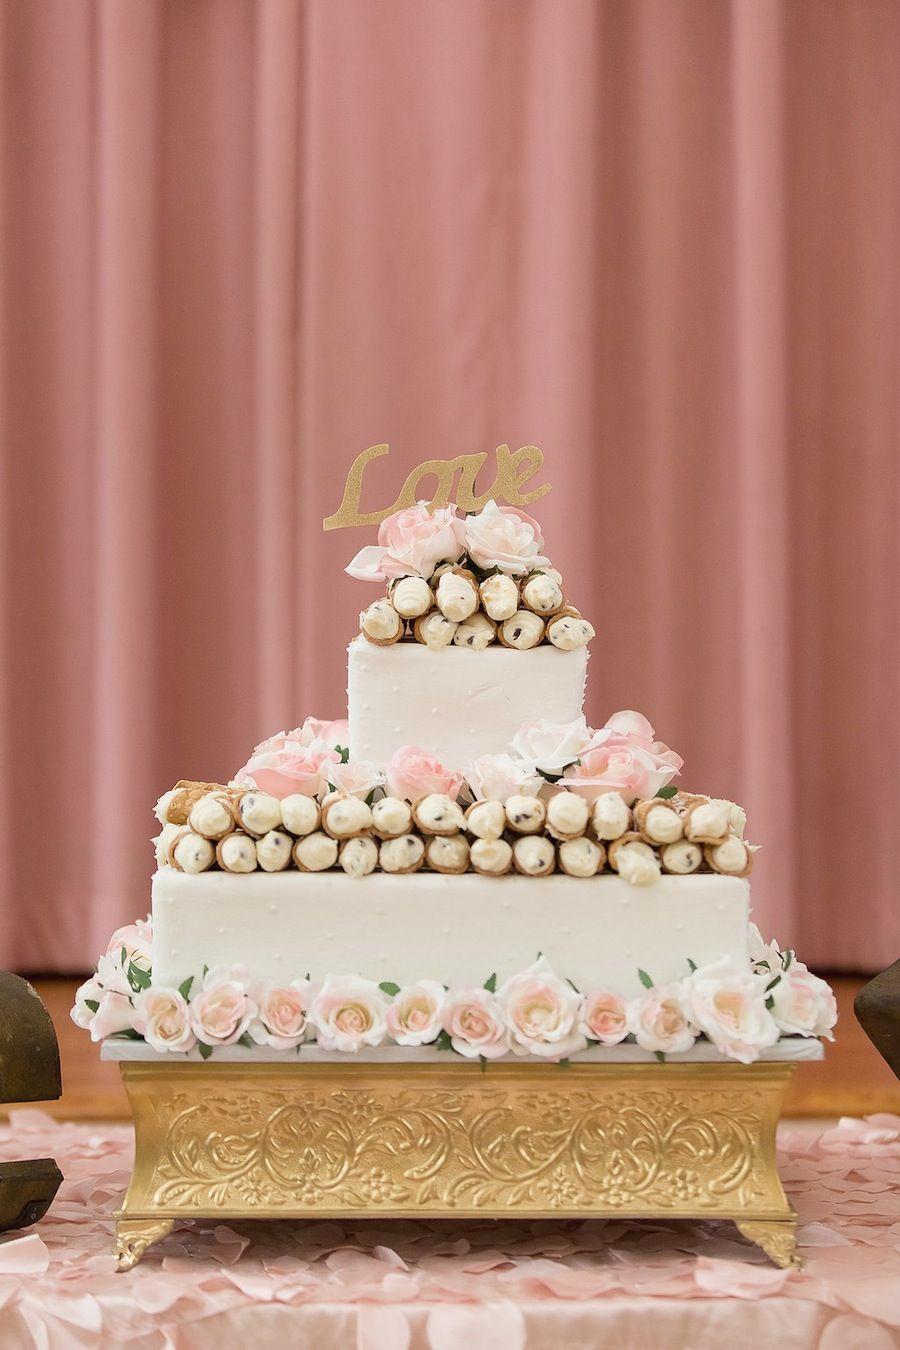 Cannoli Wedding Cake | Italian Wedding Cake | Weddings at SPWC ...